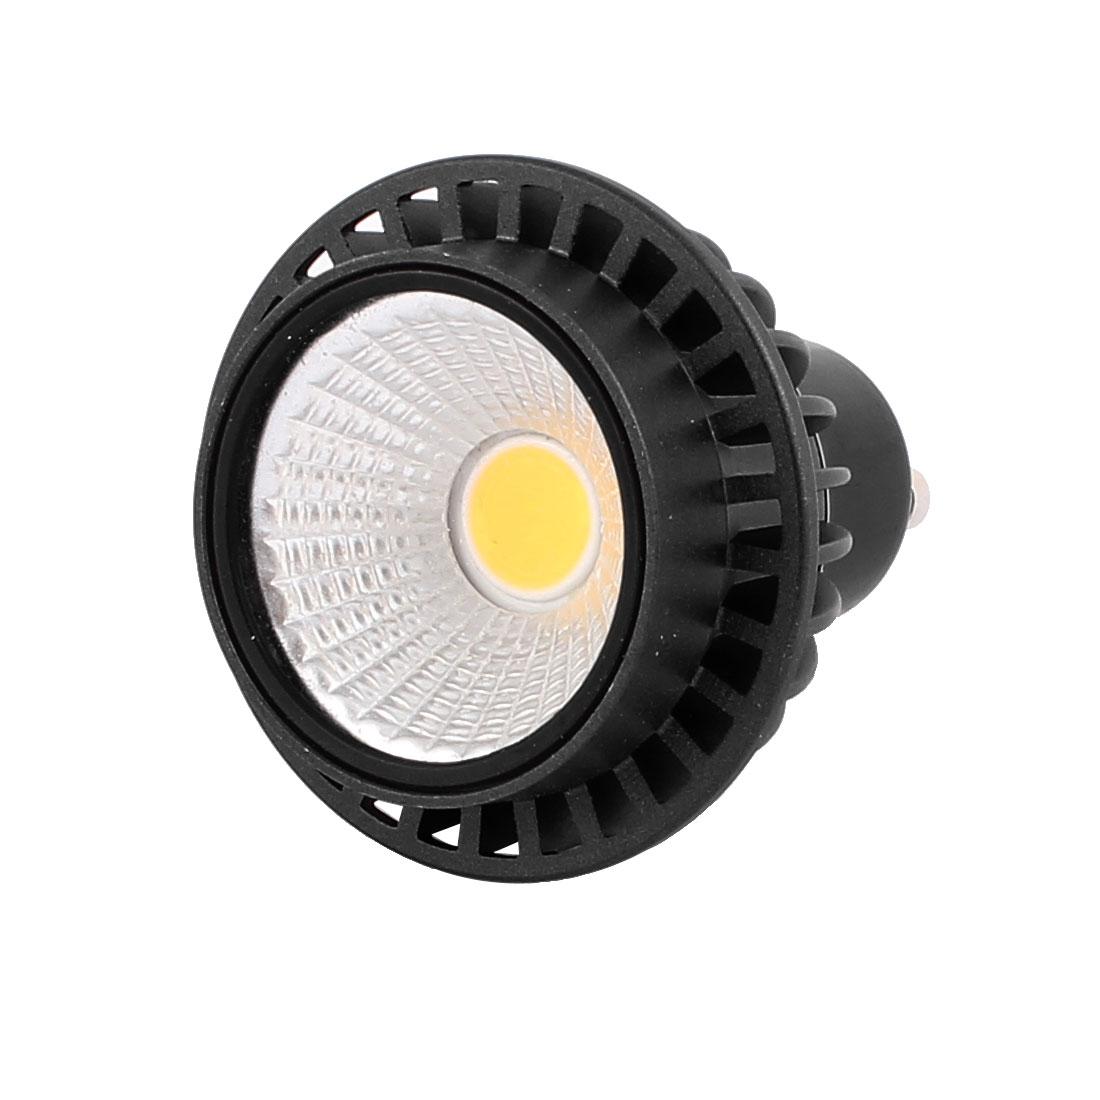 AC85-265V 3W GU10 COB LED Spotlight Lamp Bulb Round Downlight Pure White